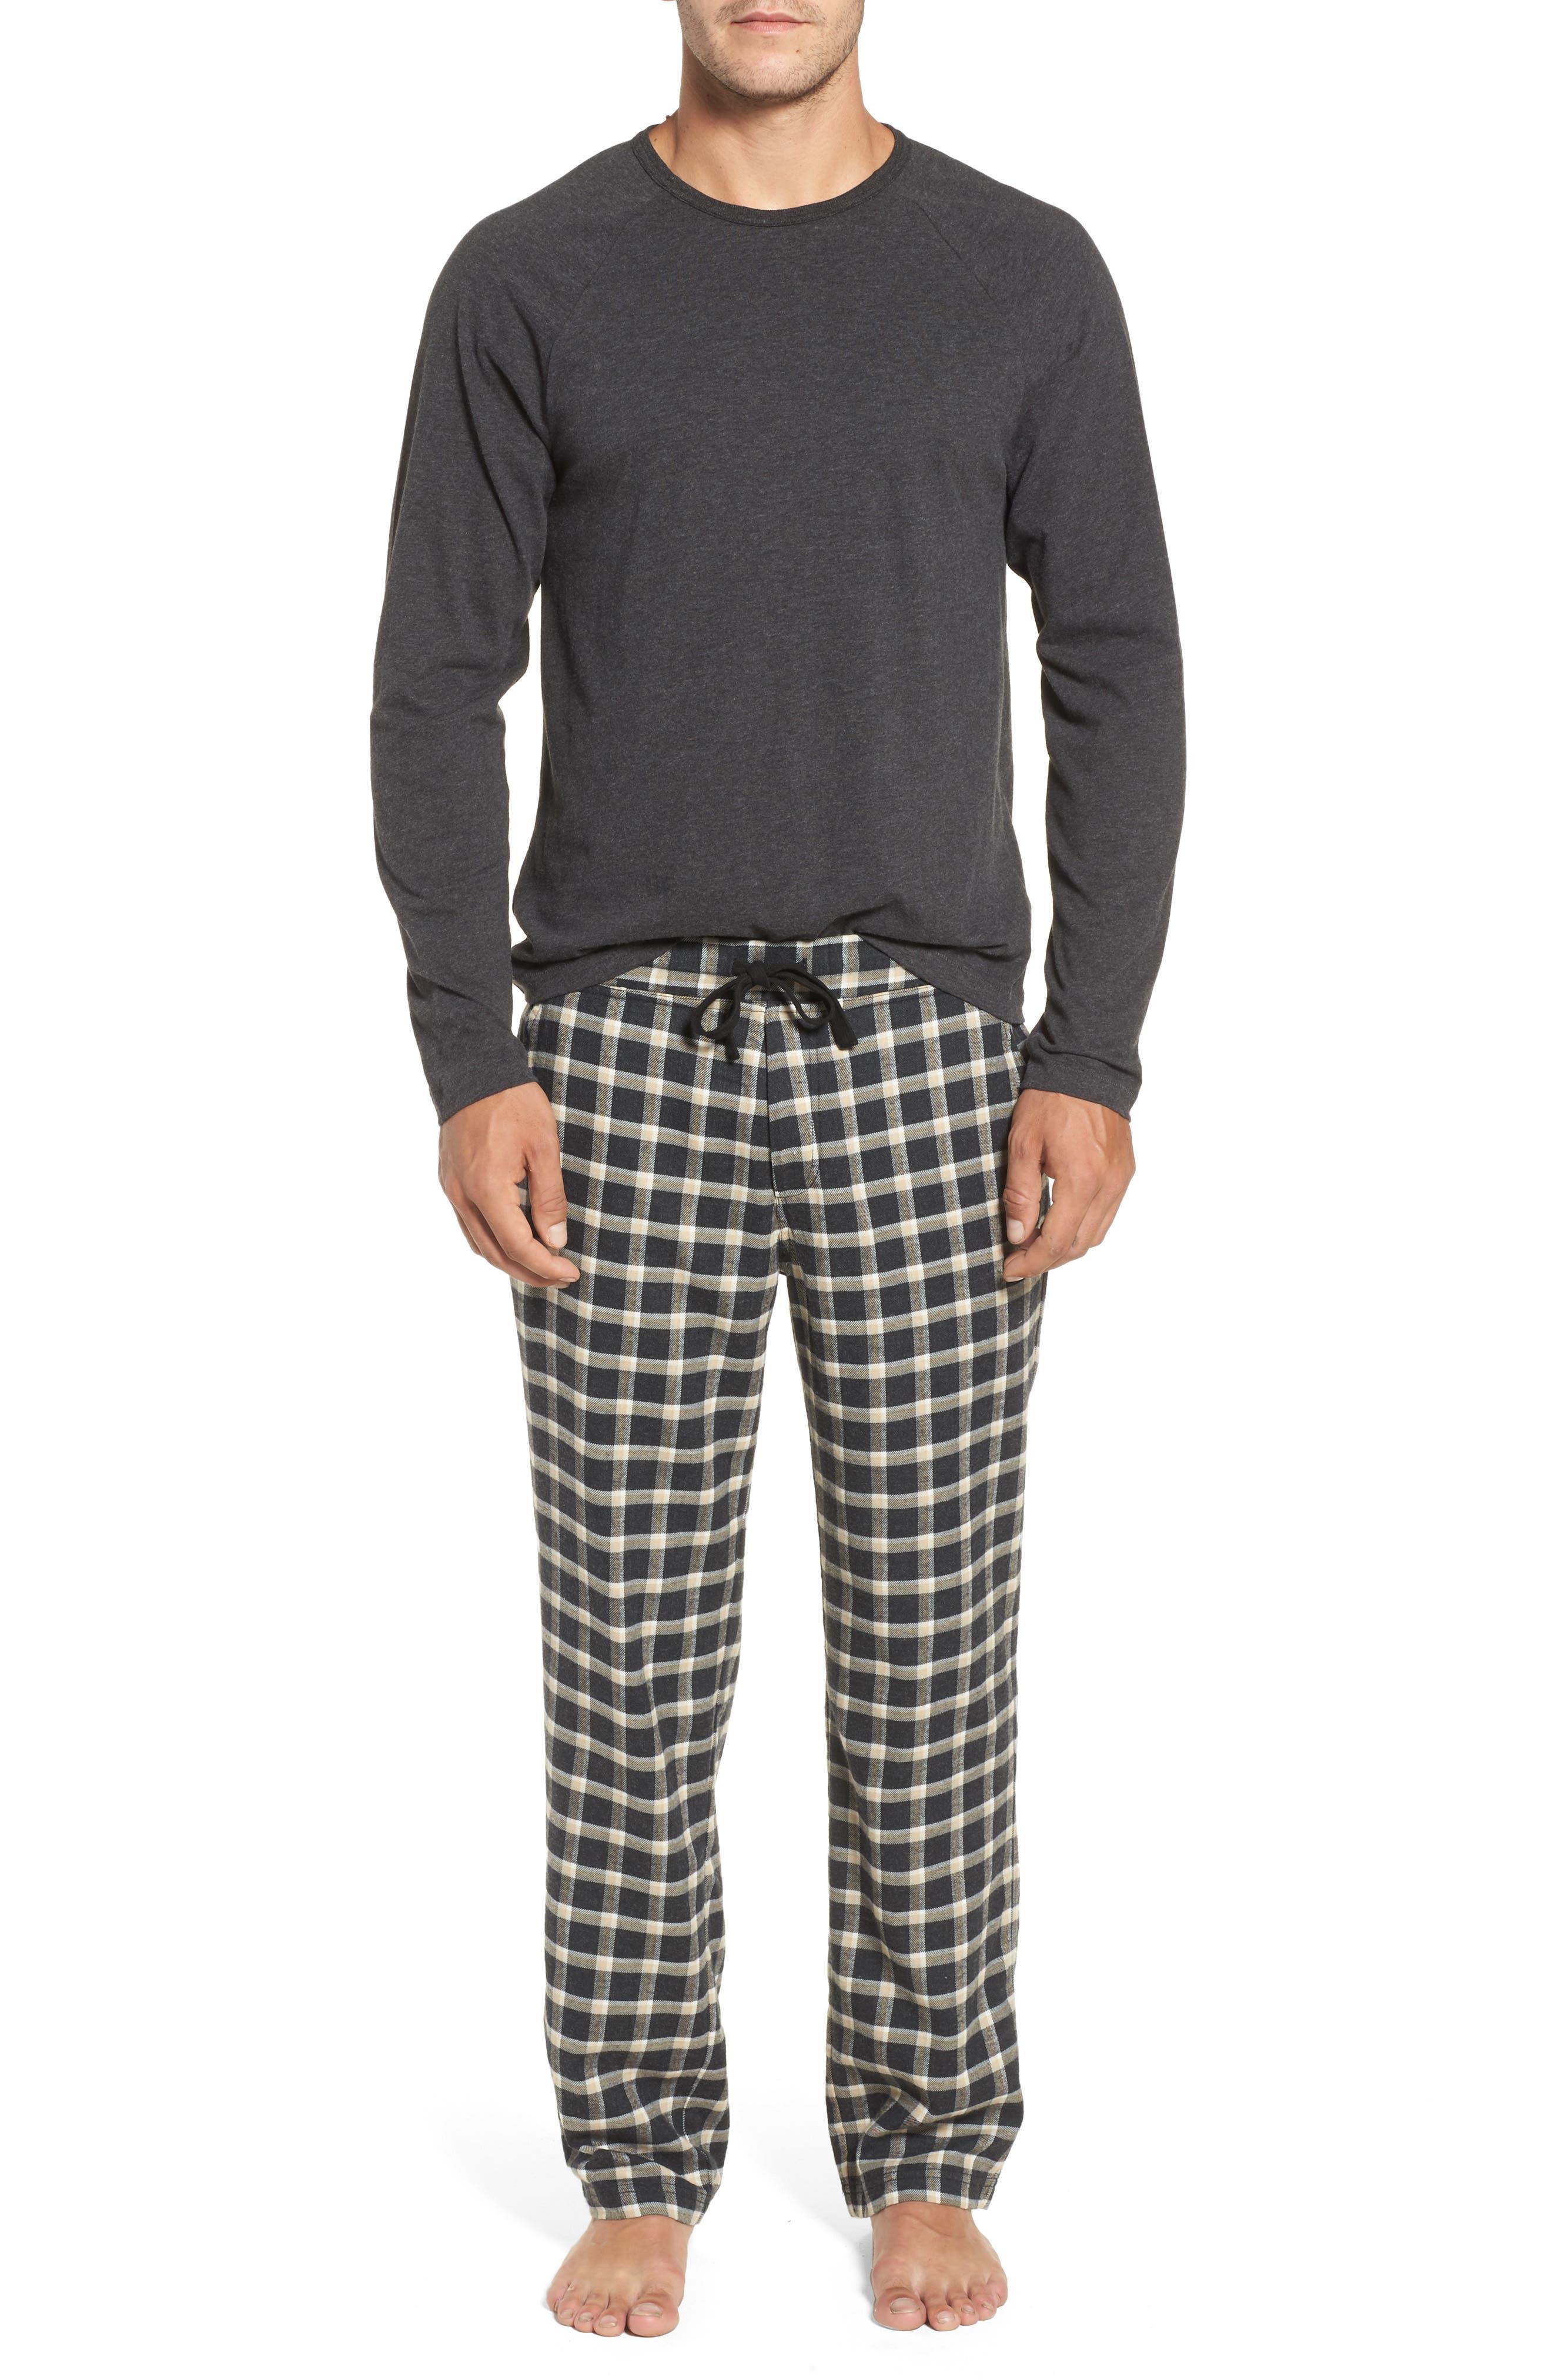 Steiner Pajama Set,                         Main,                         color,